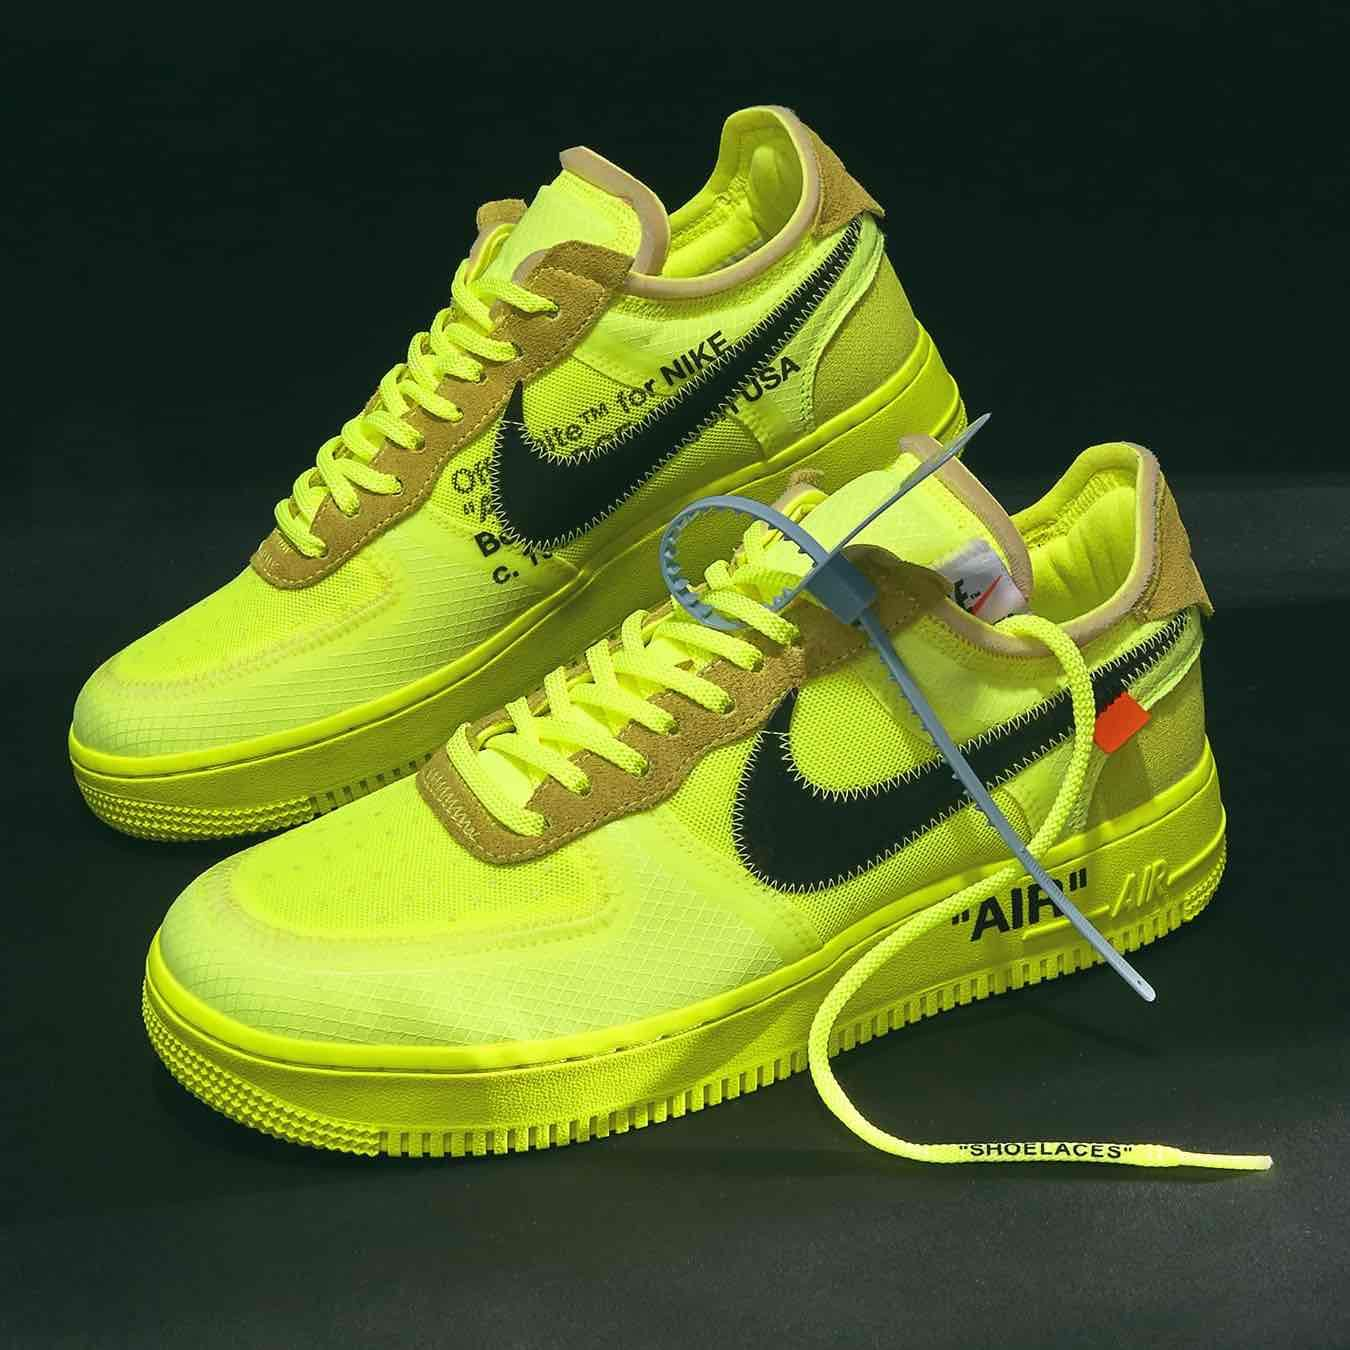 Nike x Virgil Abloh Air Force 1 Low Volt Black | Zapatos